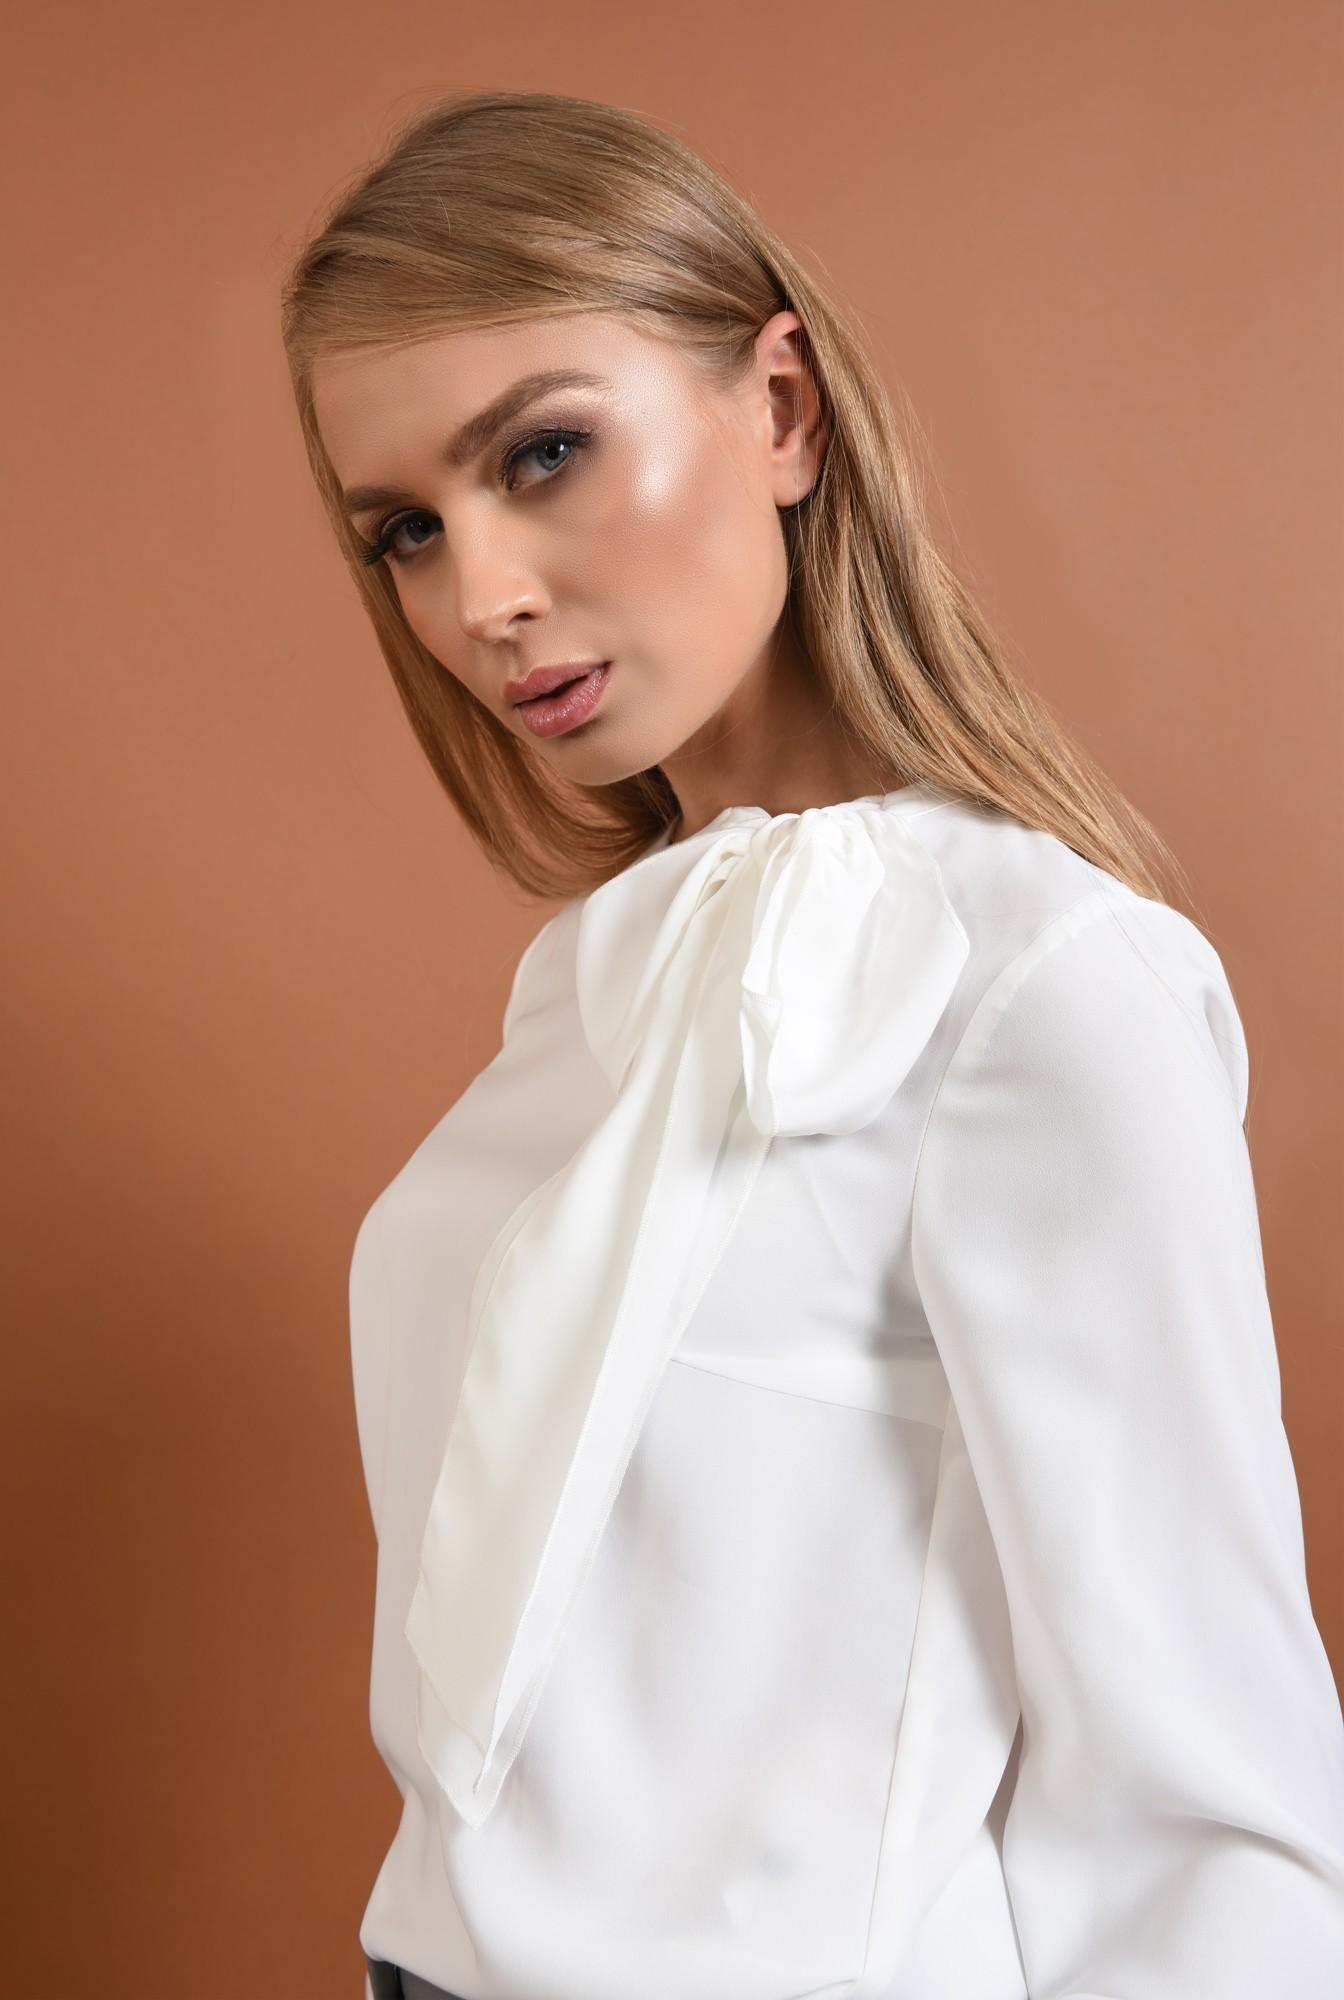 2 - Bluza casual, alb